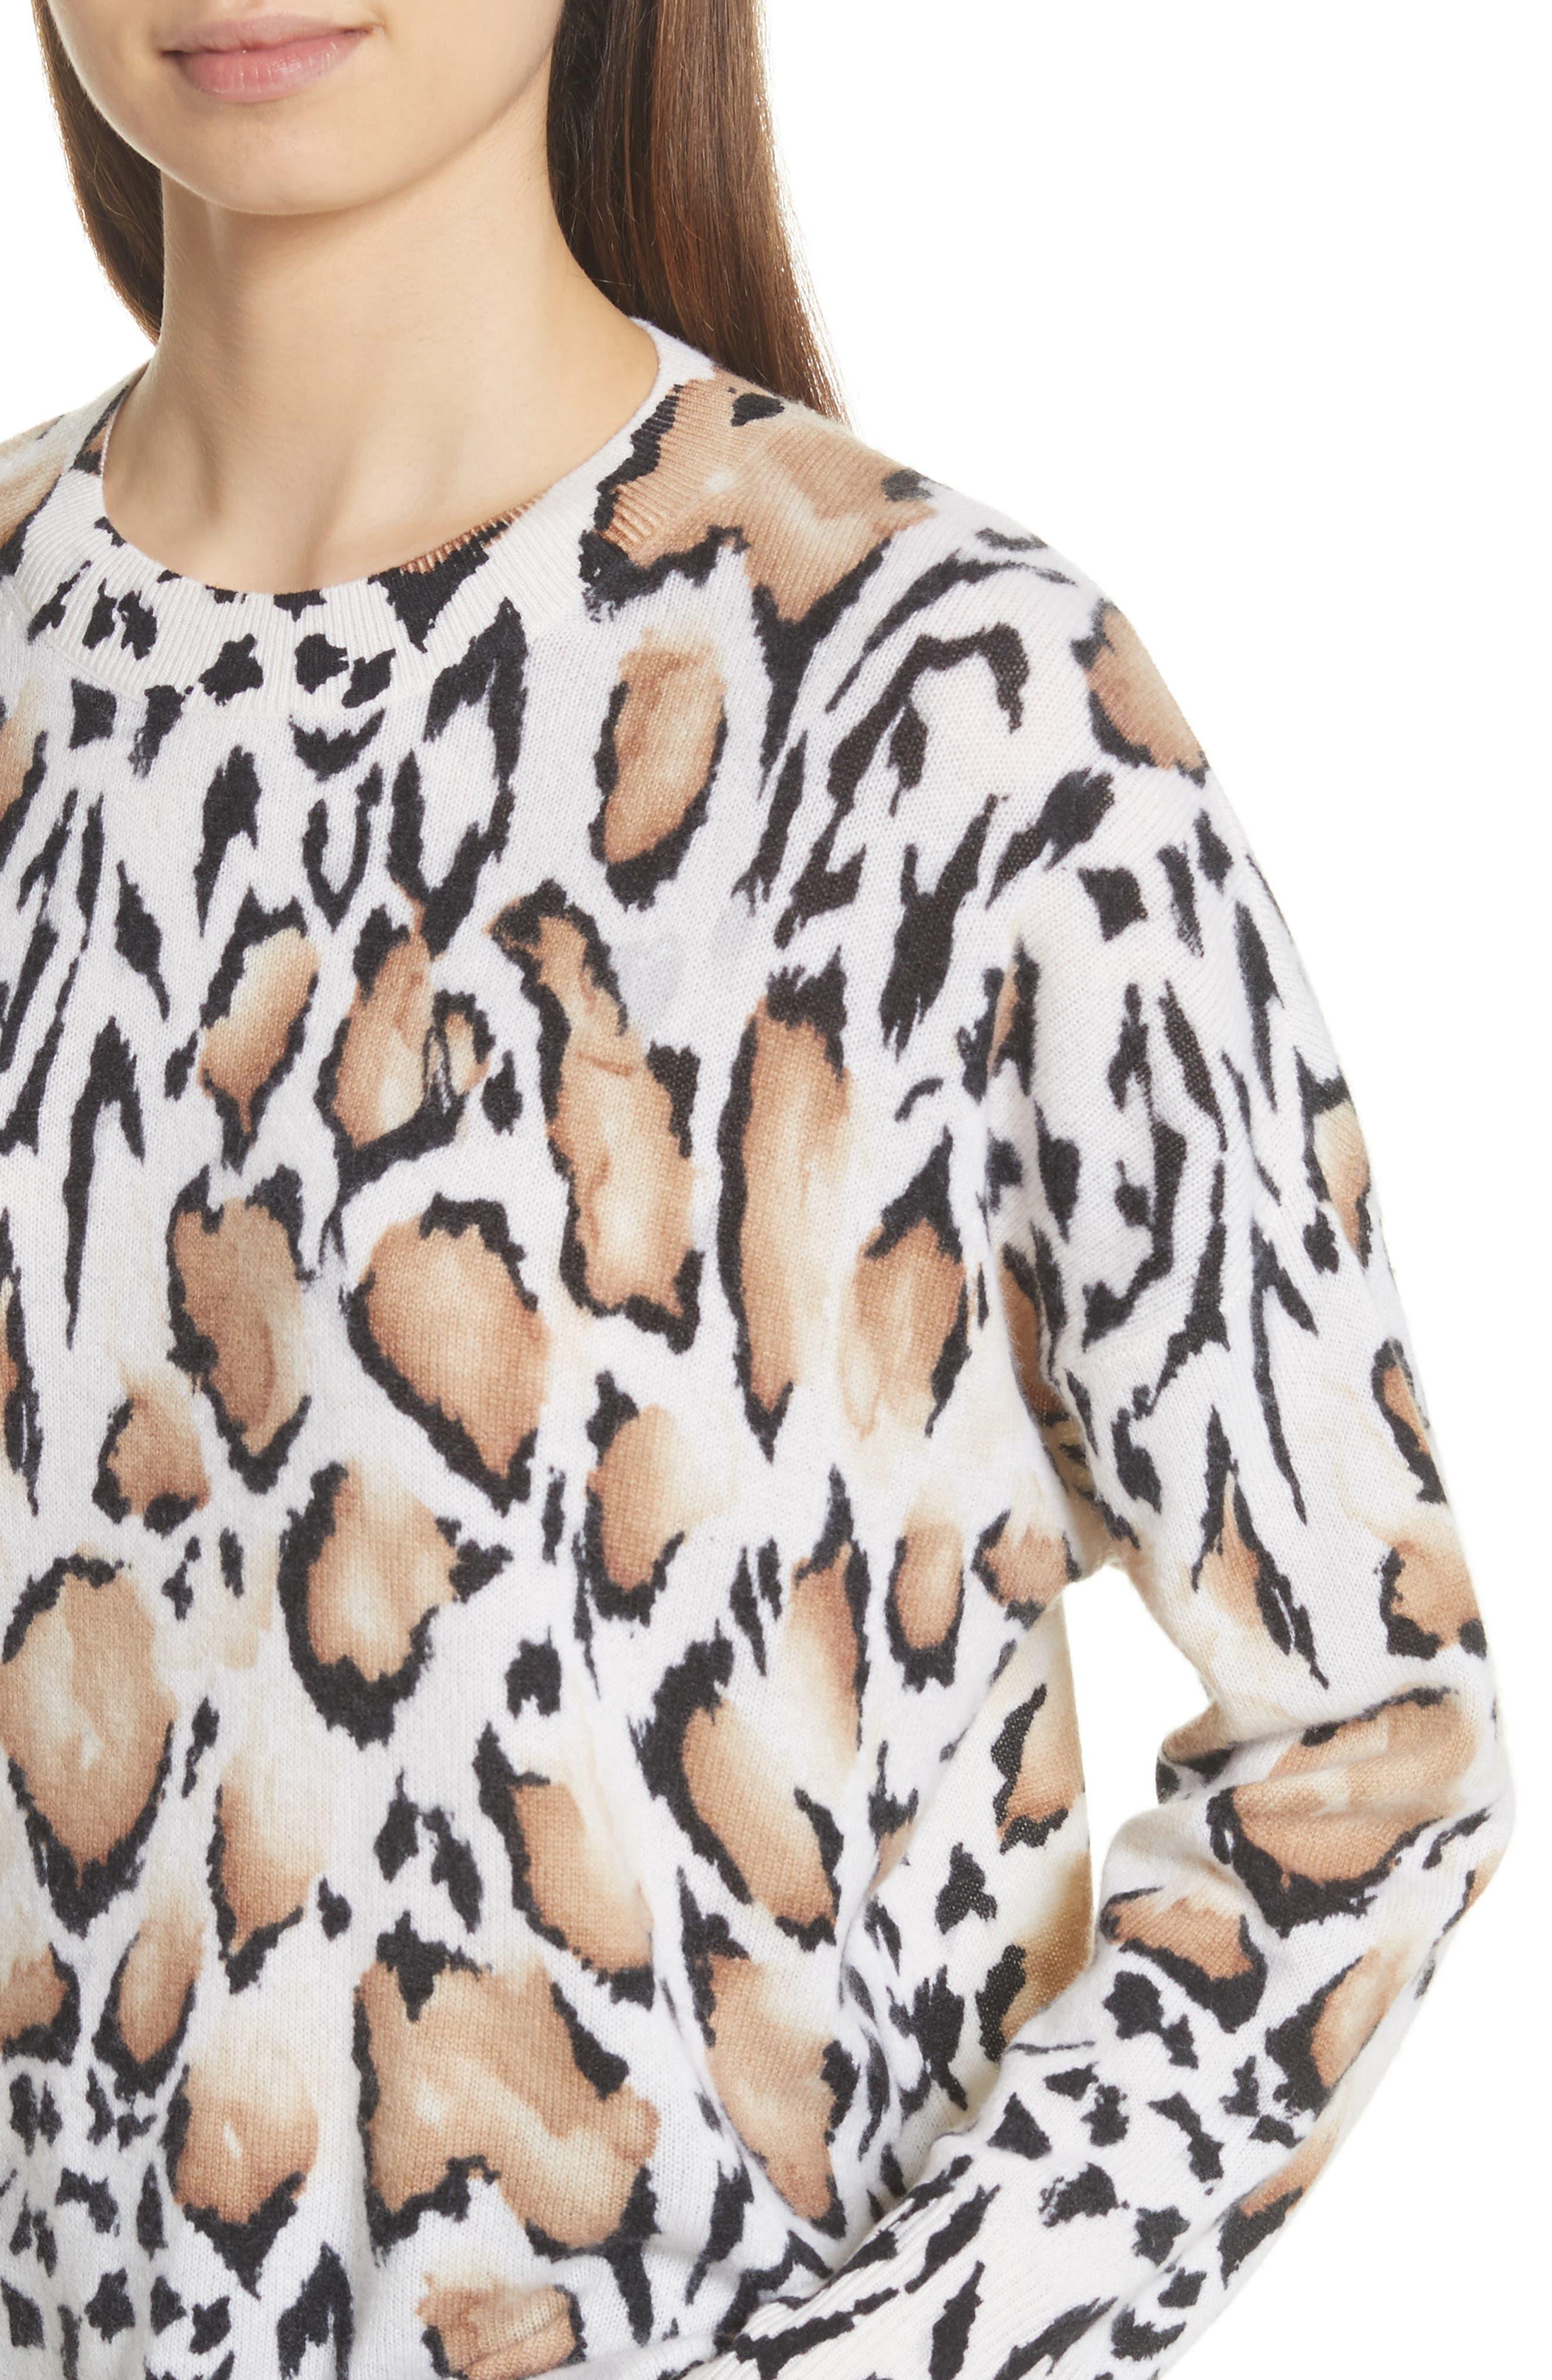 Melanie Clouded Leopard Print Cashmere Sweater,                             Alternate thumbnail 4, color,                             188